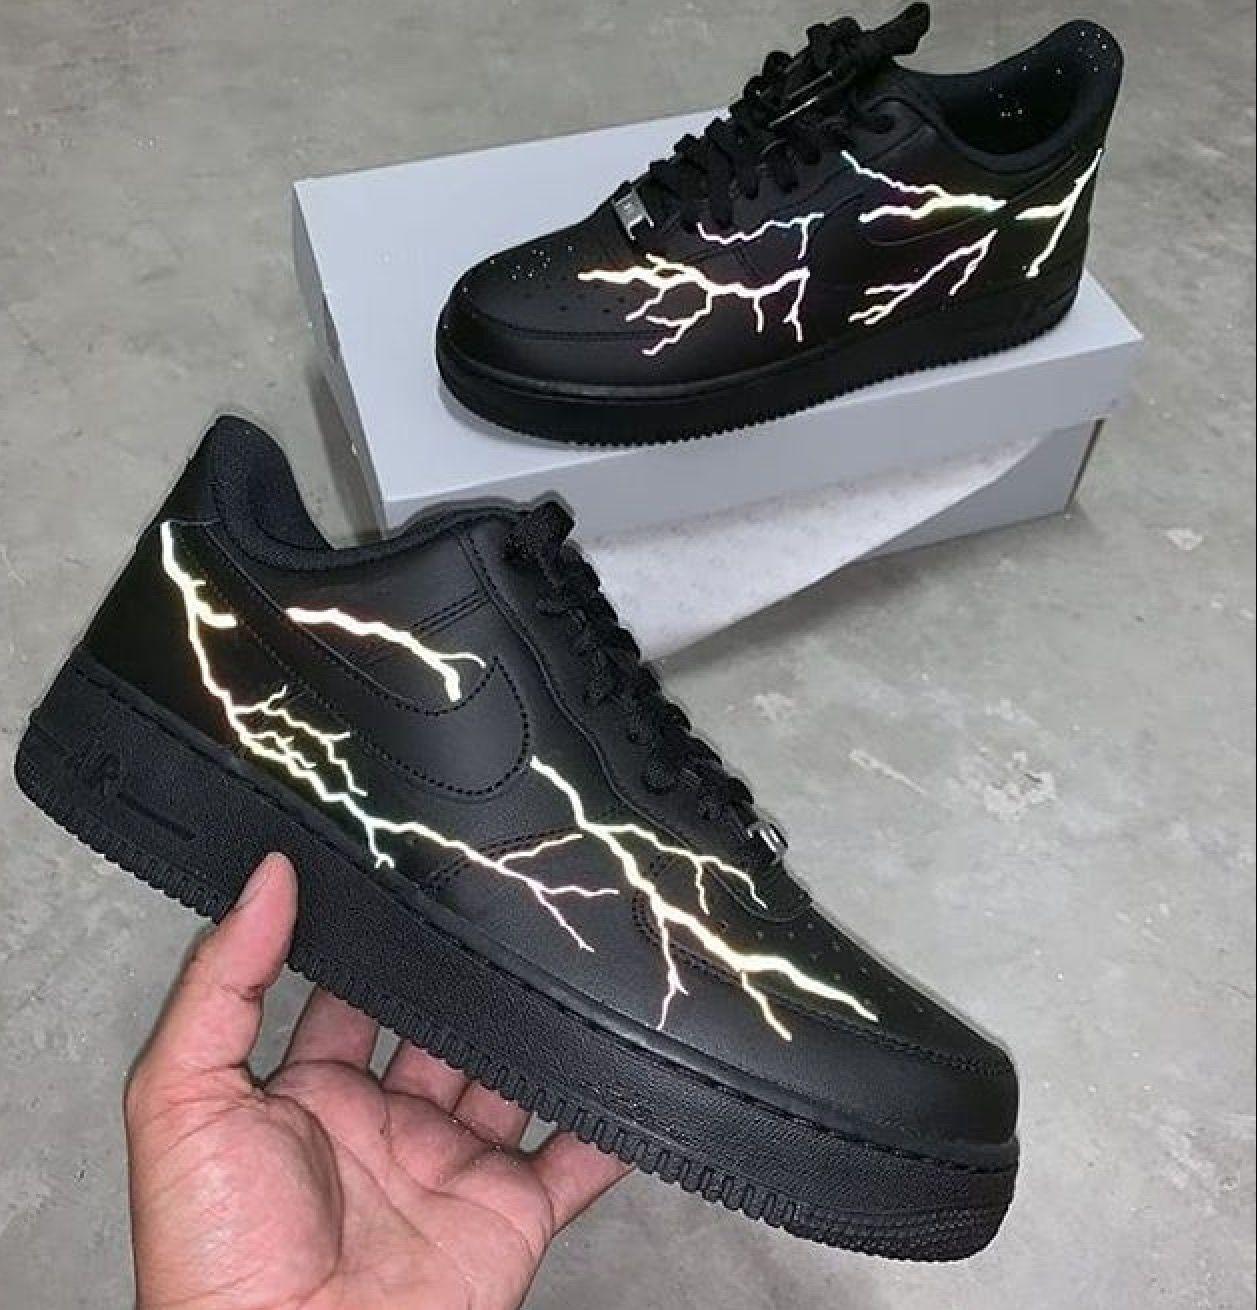 Custom black Air Force ones in 2020 Nike shoes air force